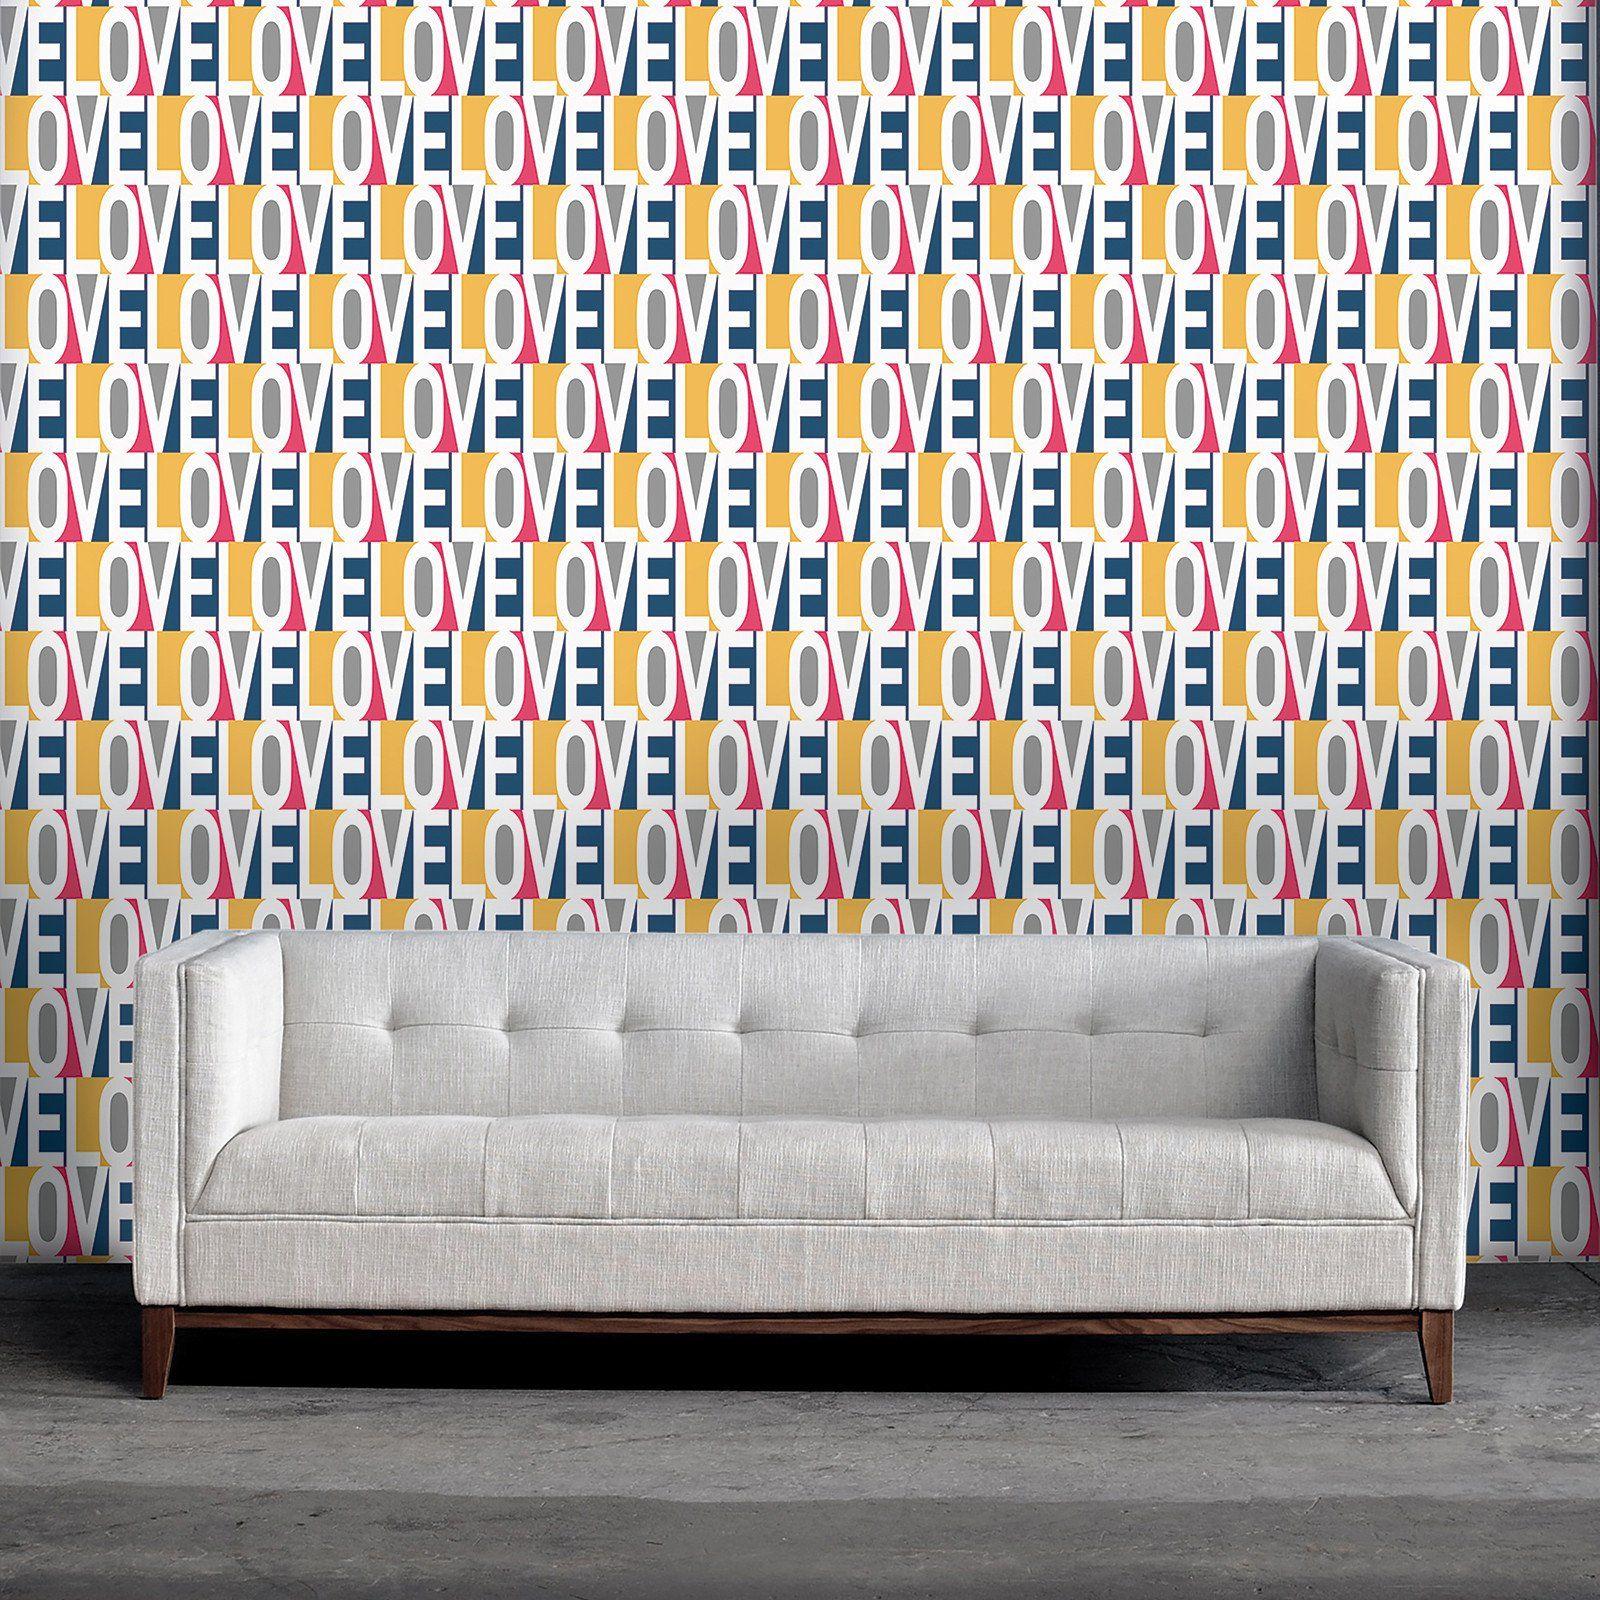 love temporary wallpaper Grey removable wallpaper